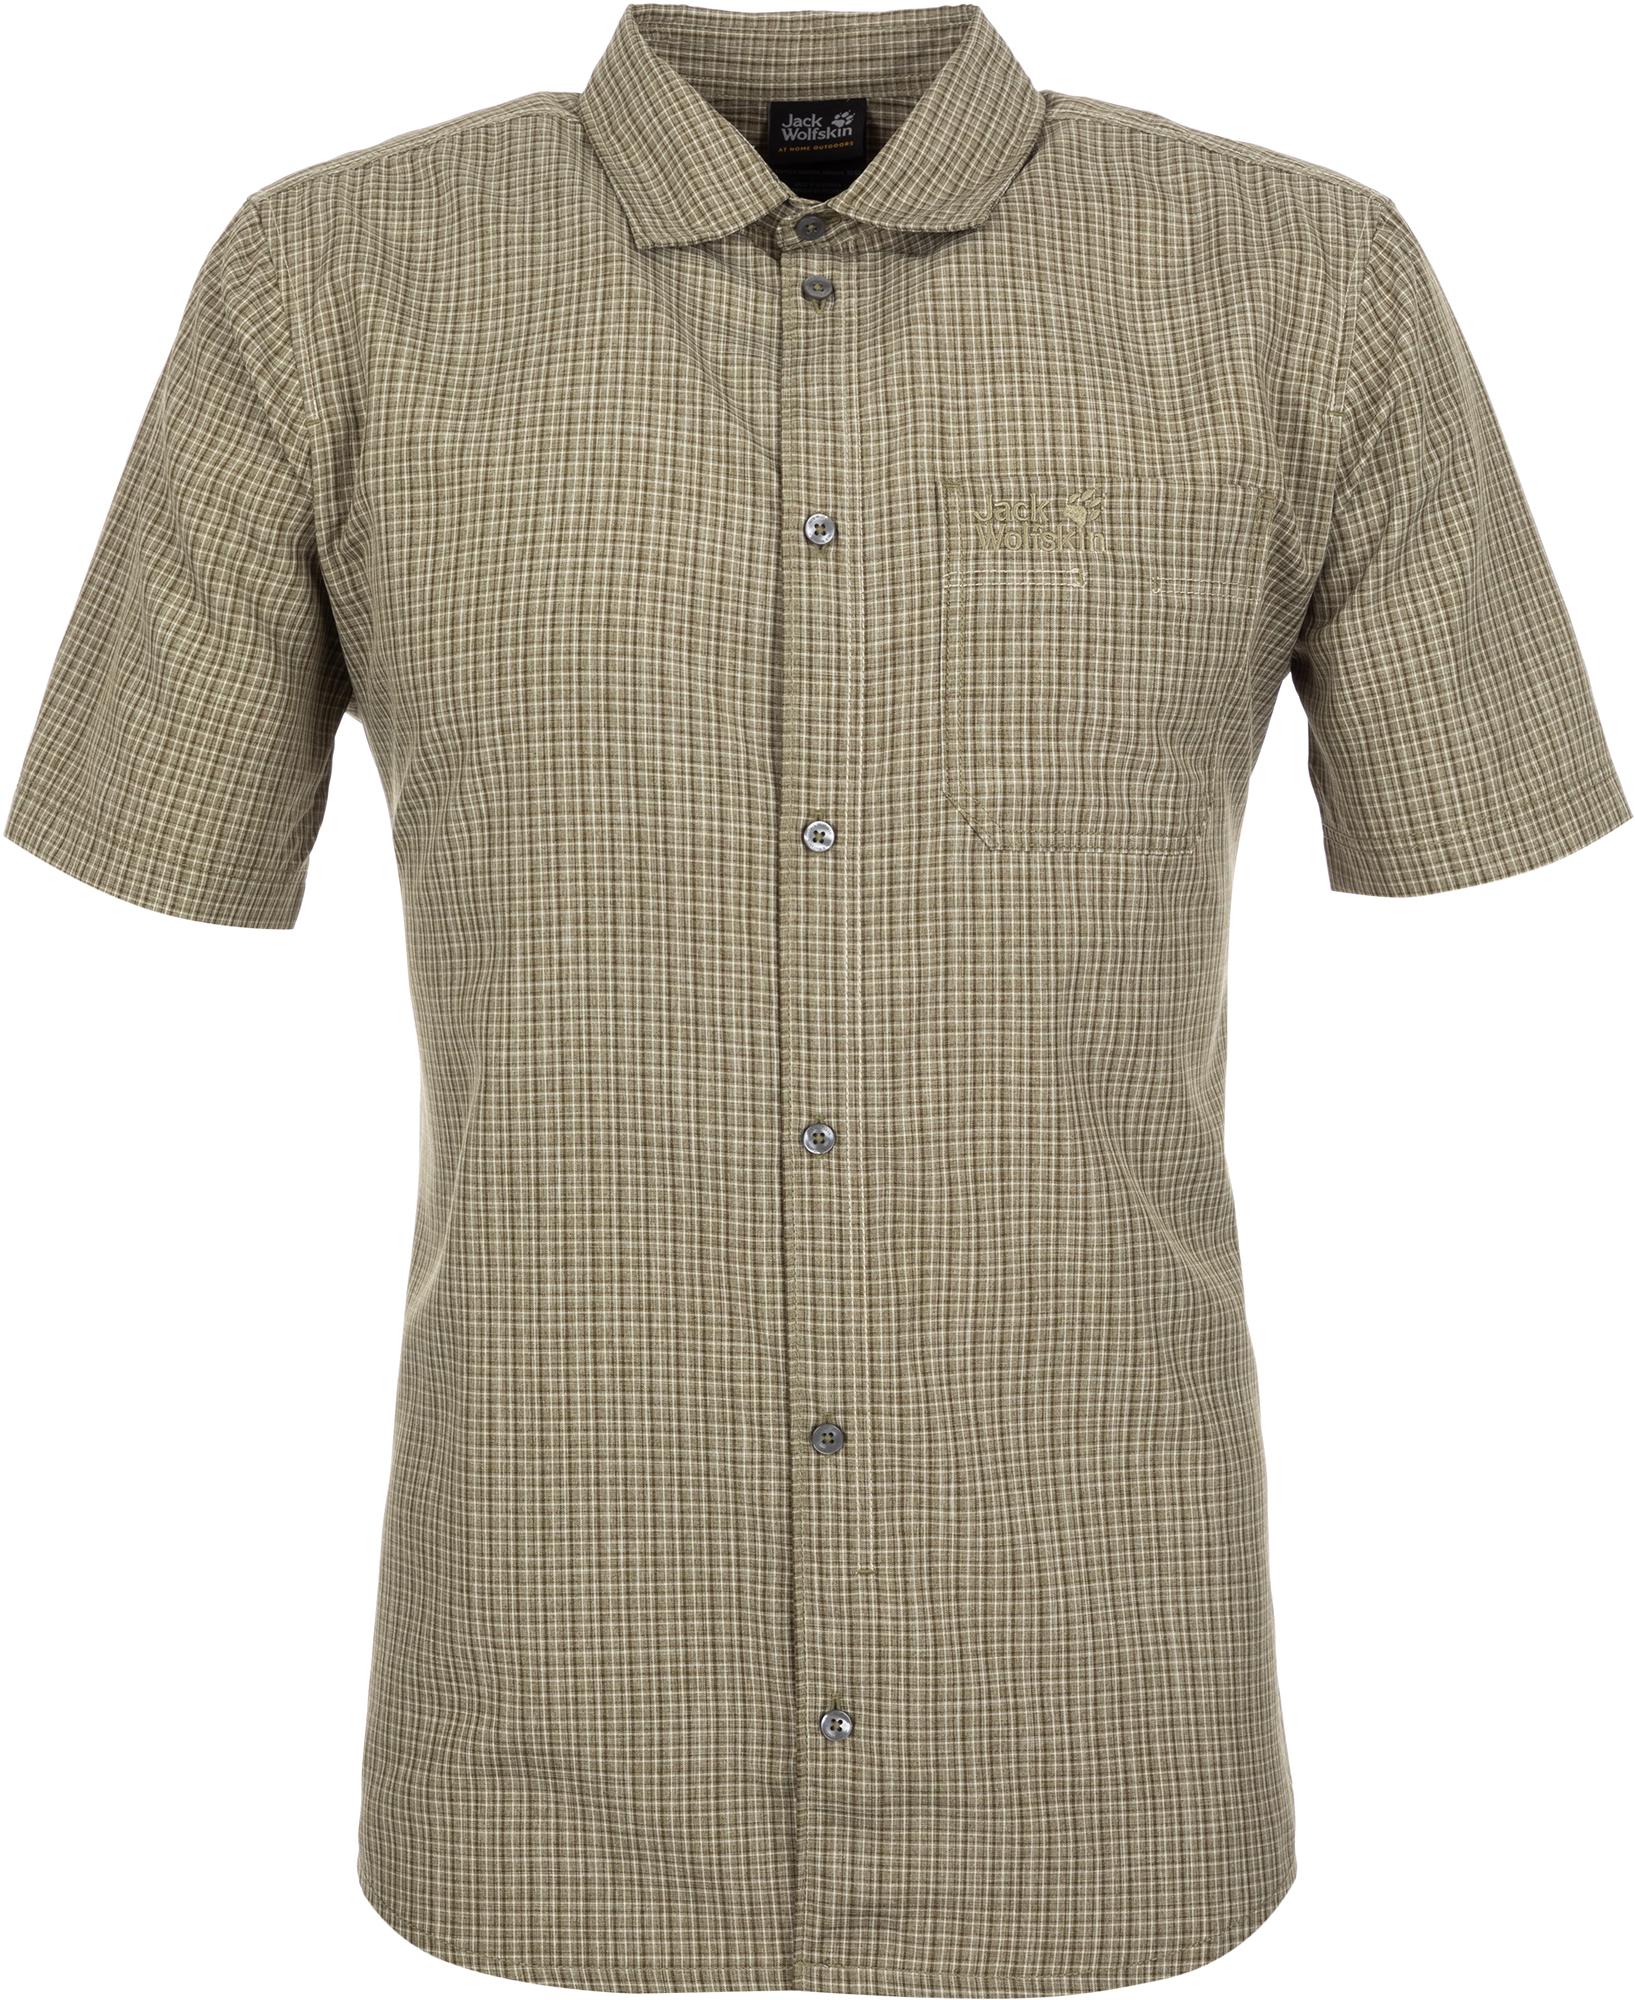 JACK WOLFSKIN Рубашка мужская JACK WOLFSKIN El Dorado, размер 54-56 цена